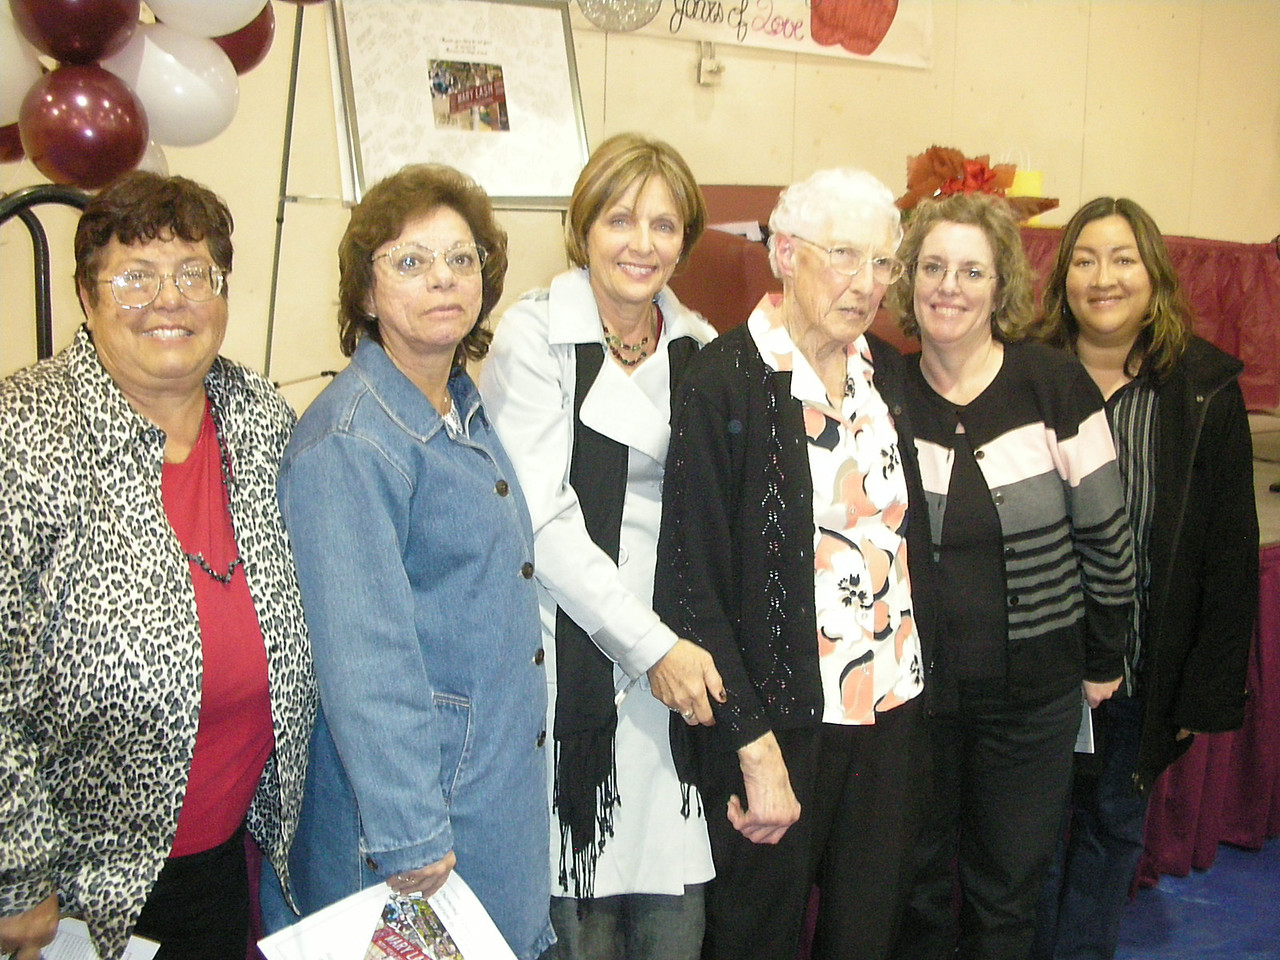 Gamma Zeta Members: Suzanne Frazer, Juanita Rivas, Jackie Wayman, Mary Lash, Karen Bowen, Irene Pritchett Romero at Paramount Unified School District Celebration of Mary Lash's 50 years in education.